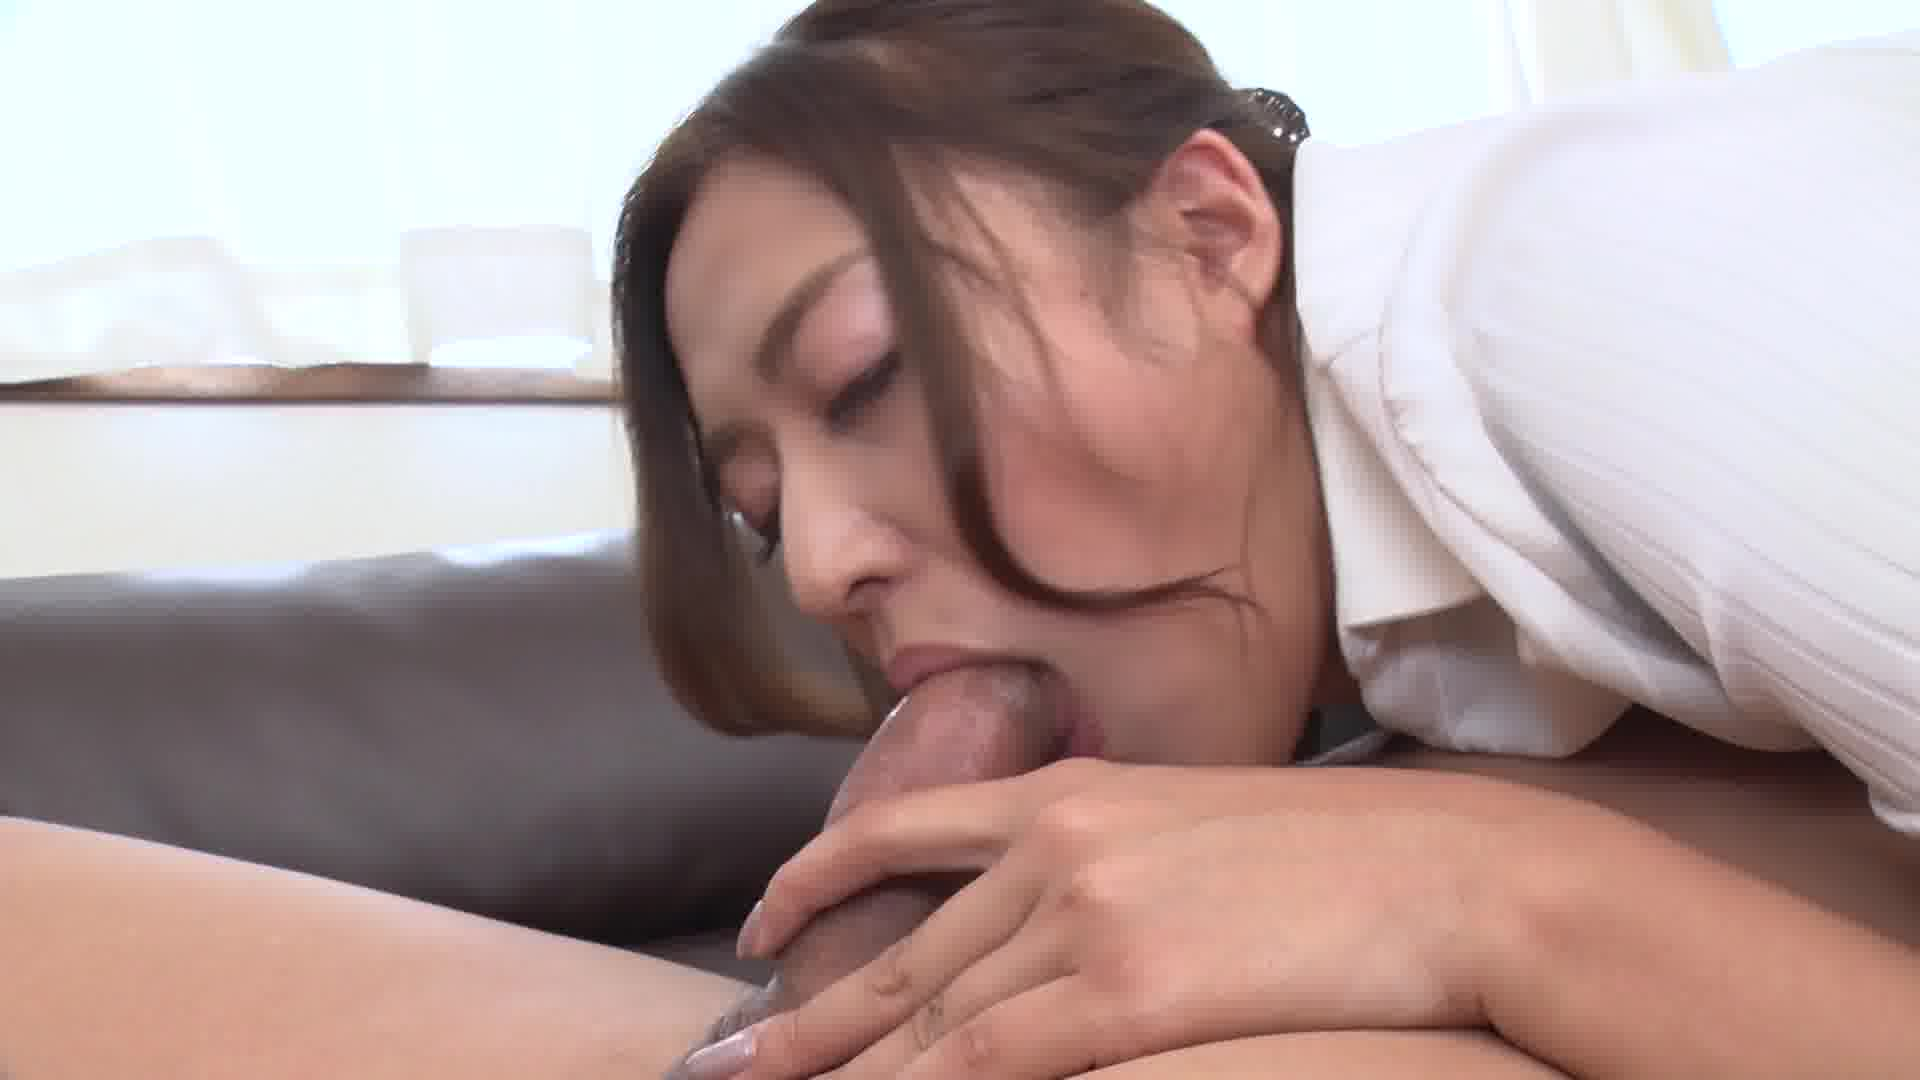 THE 未公開 〜尻コキ・尻コキ・尻コキ2〜 - 日向るな【痴女・パイパン・美尻】